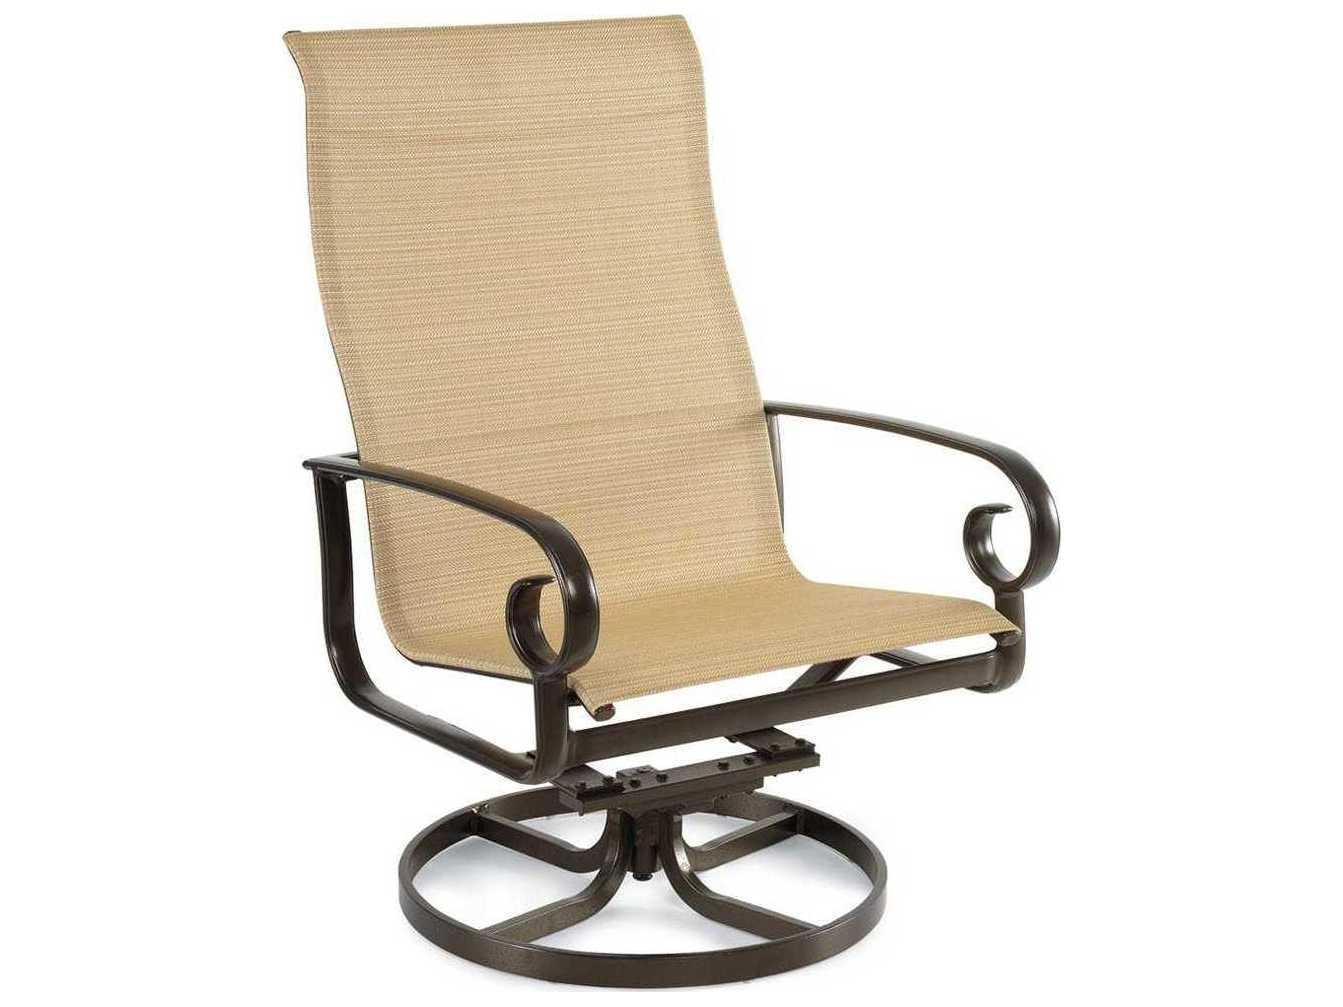 Winston Veneto Sling Cast Aluminum Arm Swivel Lounge Chair